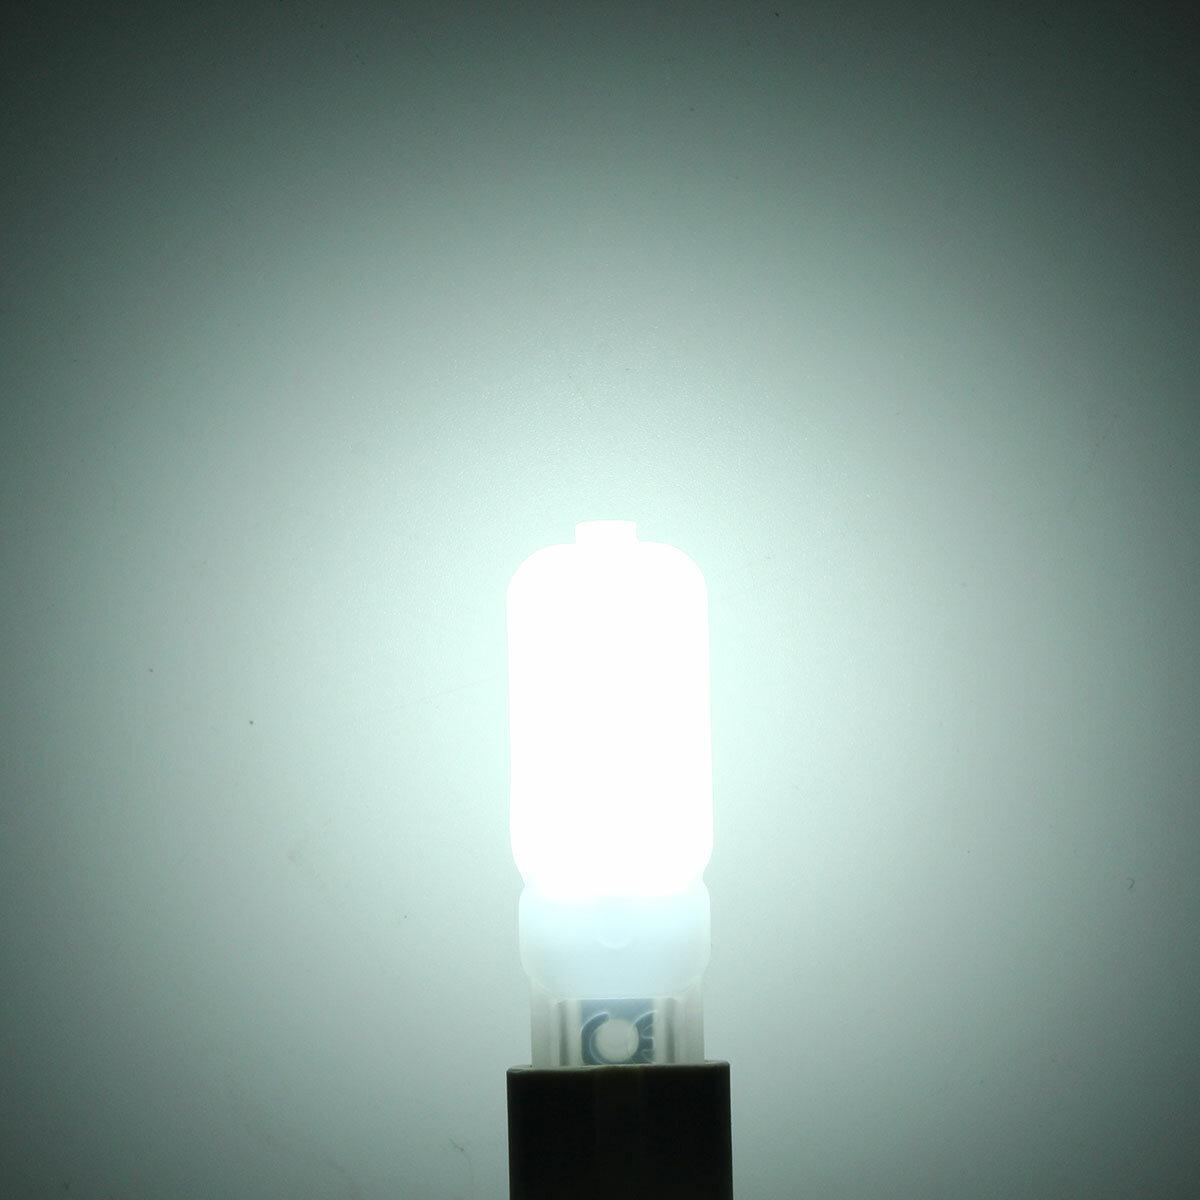 E27/E14/E12/B22/G9/GU10 LED Bulb 4W SMD 4014 56 400LM Pure White/Warm White Corn Light Lamp AC 220V - 5